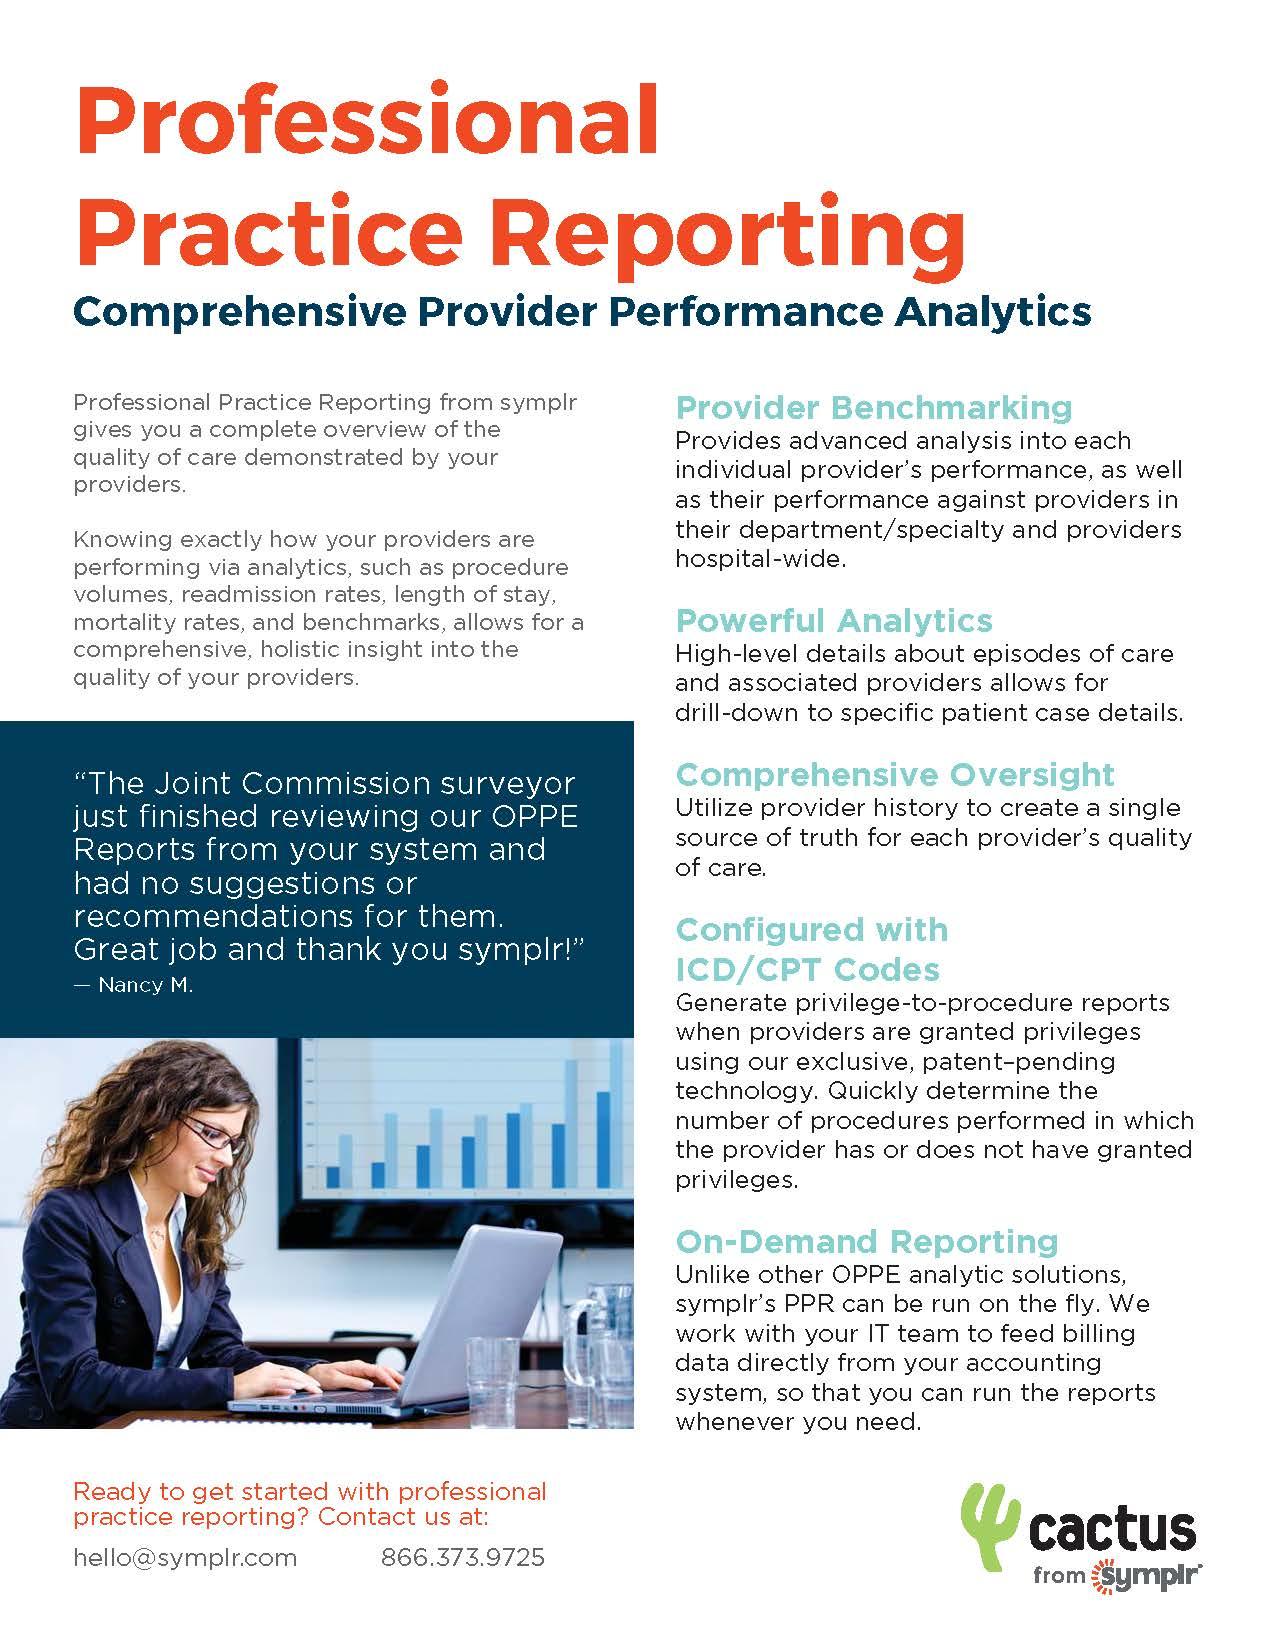 Professional Practice Reporting Flyer.jpg